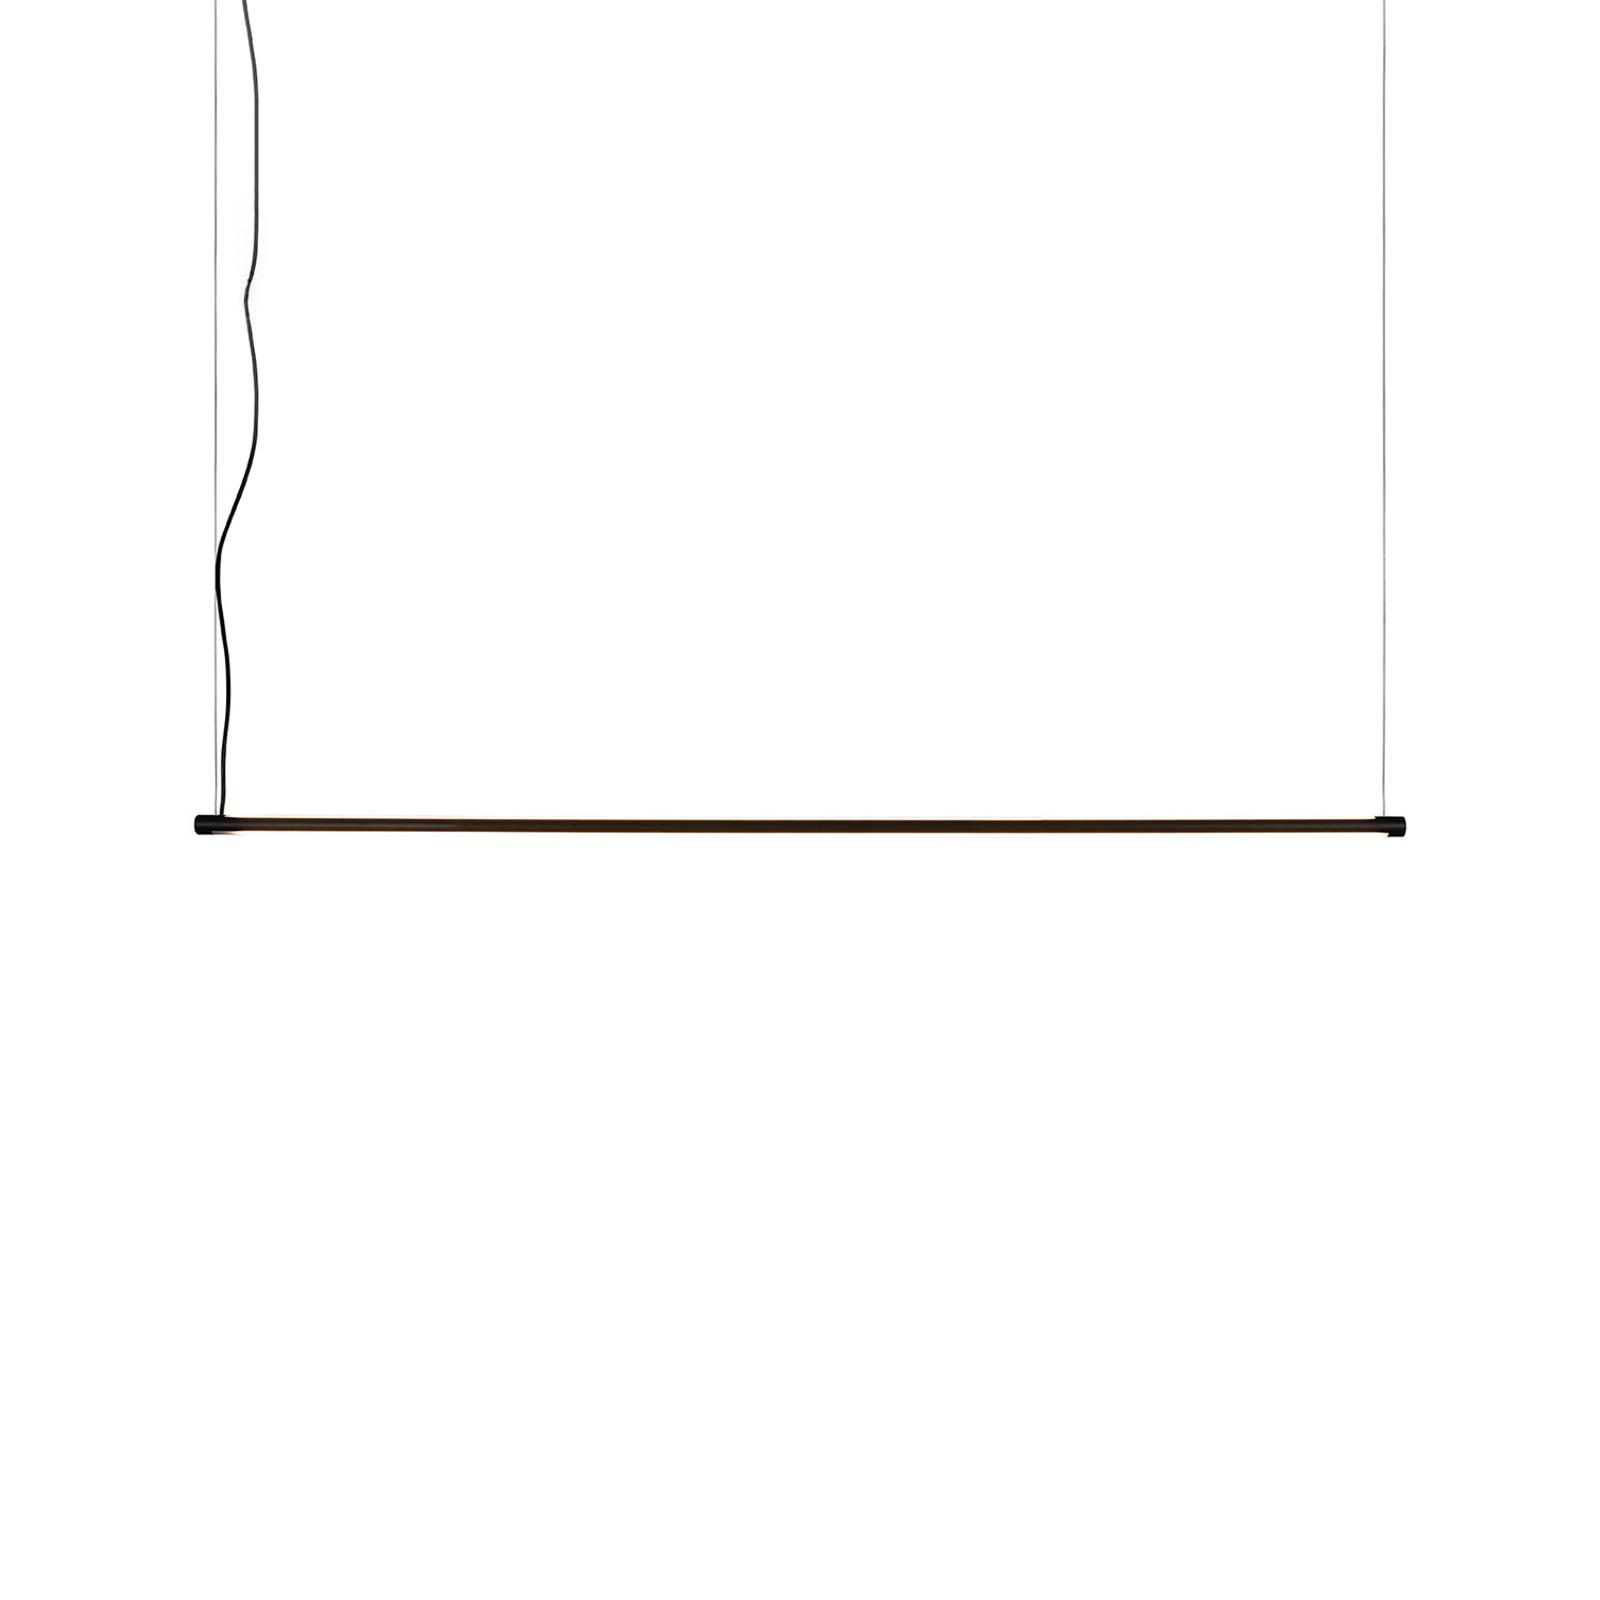 Karman Cupido LED-Balkenlampe 99cm App-Steuerung